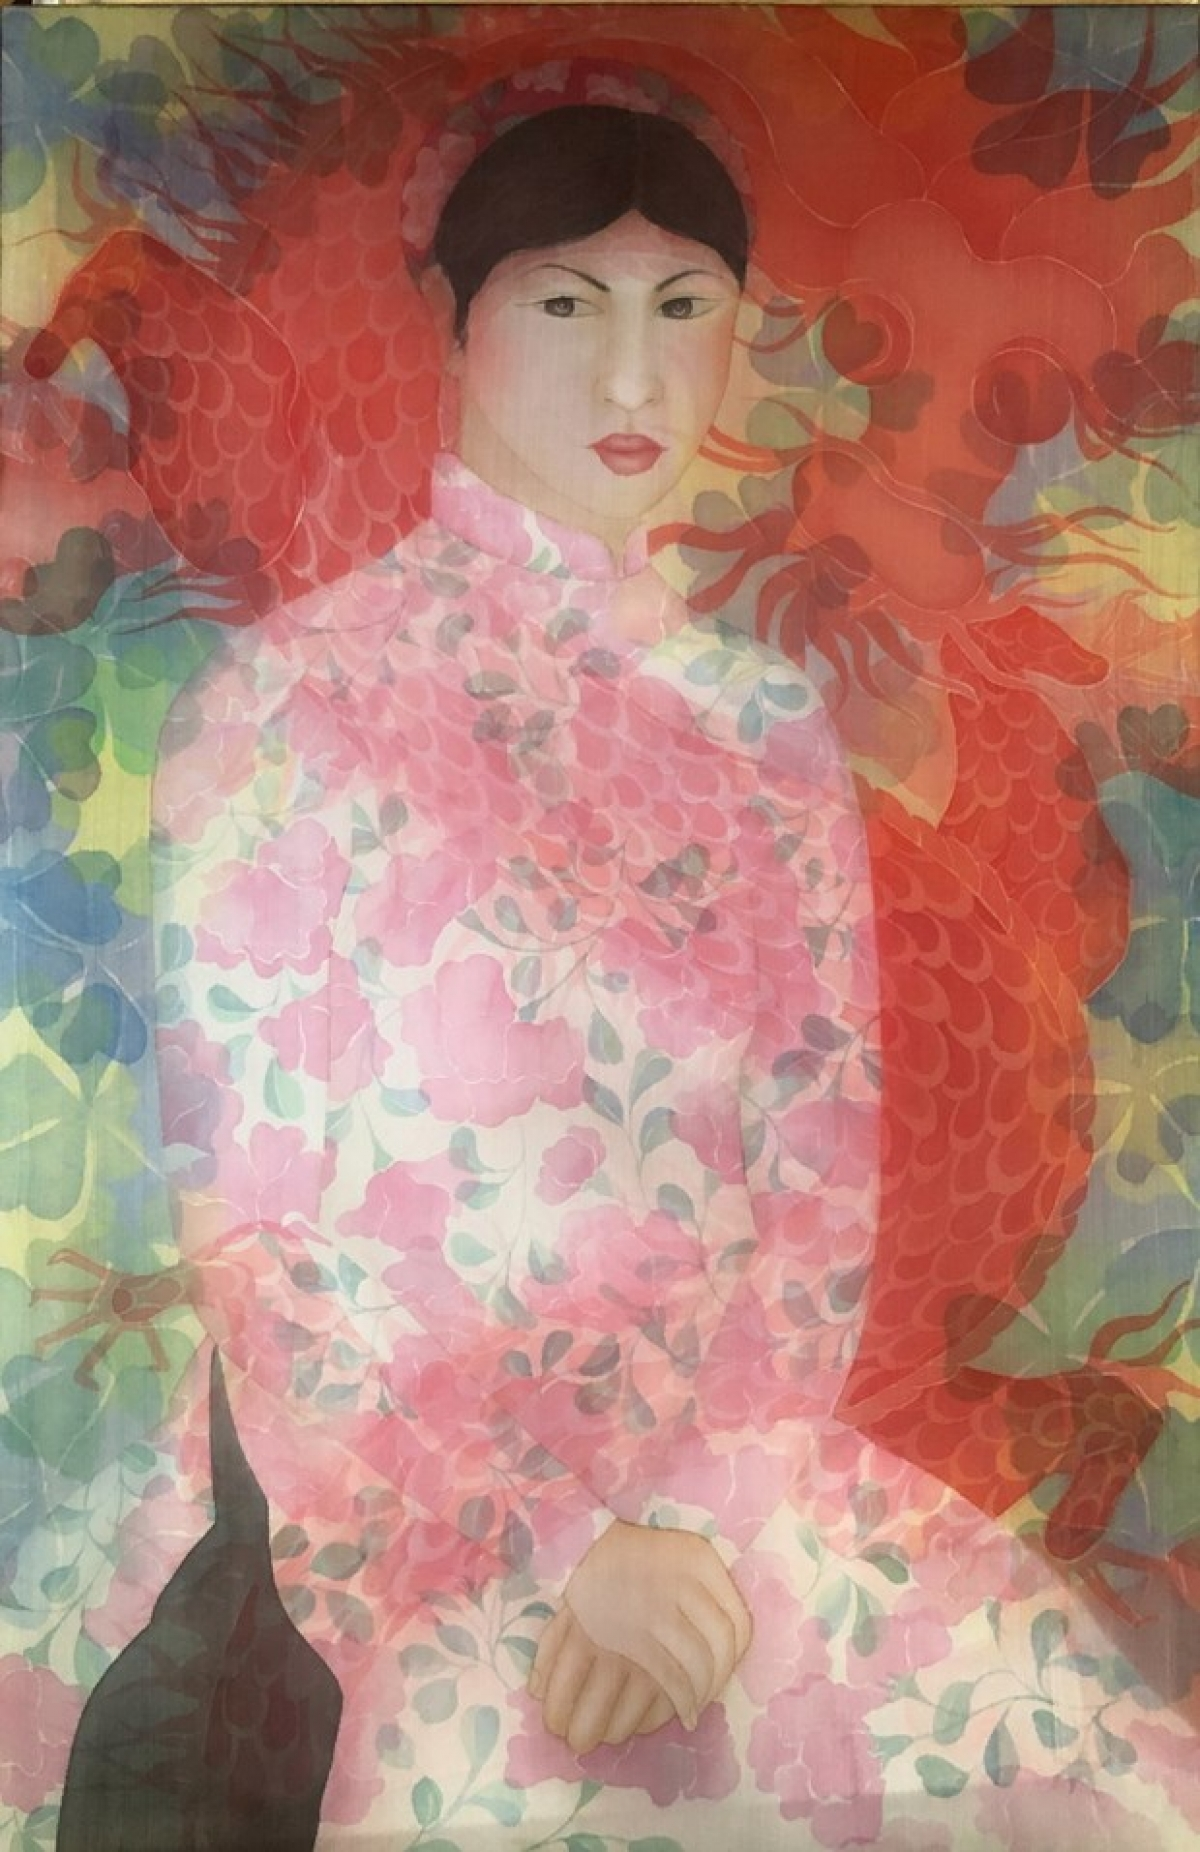 A silk painting drawn by Nguyen Thi Chau Giang back in 2015. (Photo: Nguyen Thi Chau Giang/APT10)